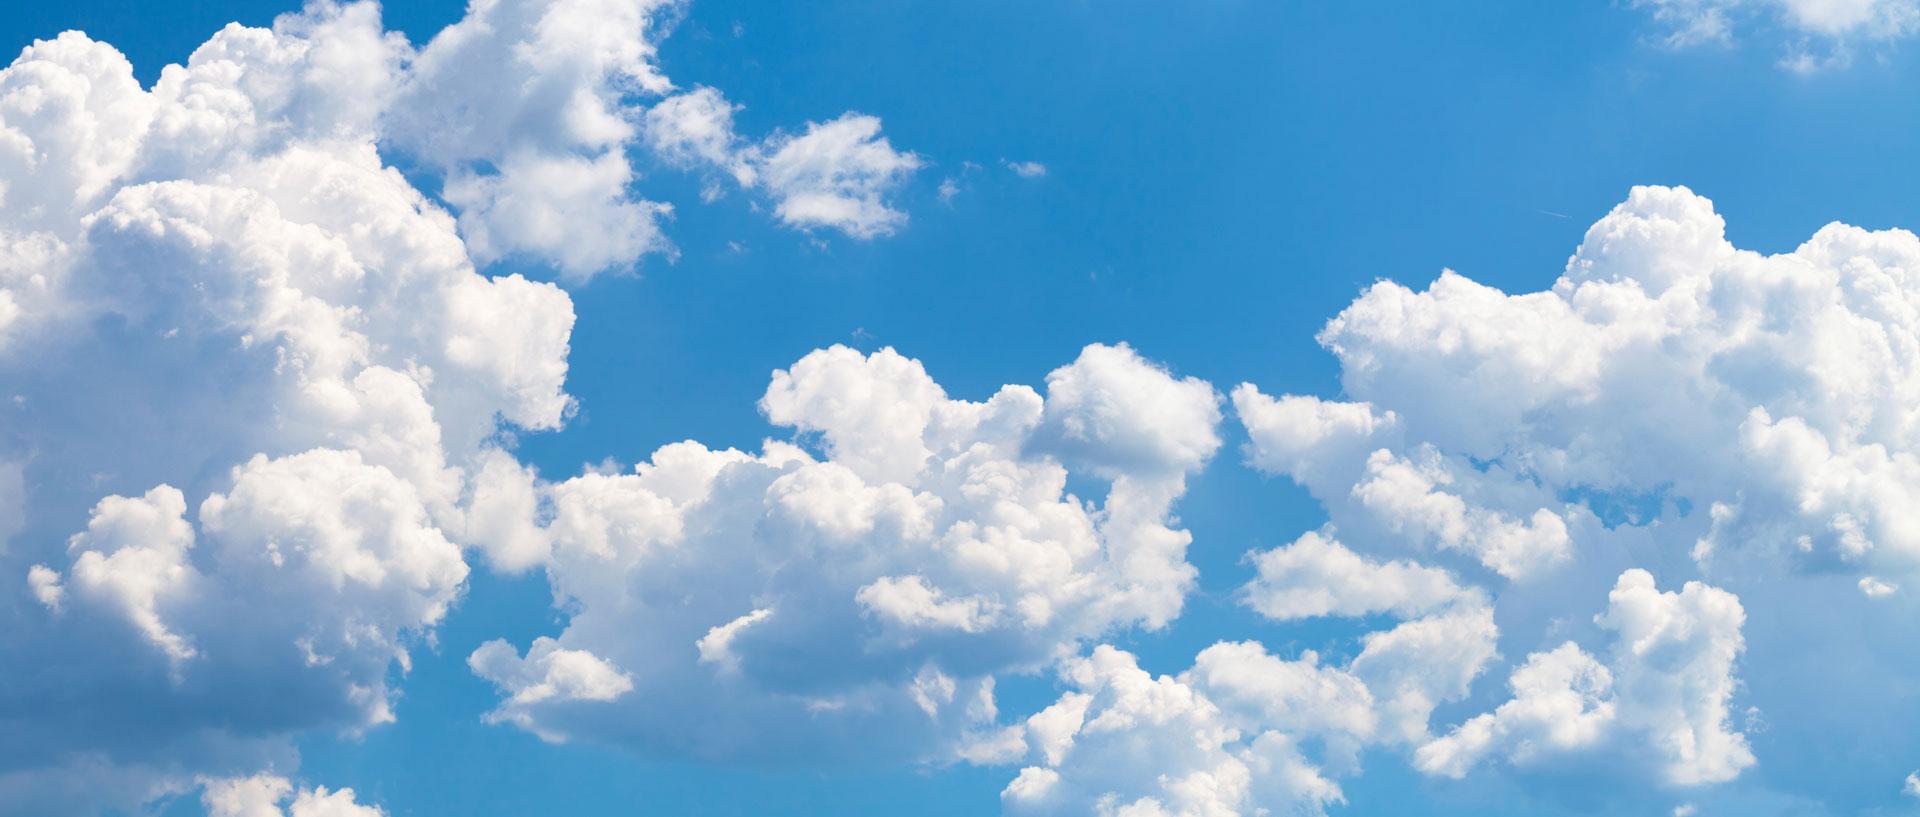 cloud interconnect